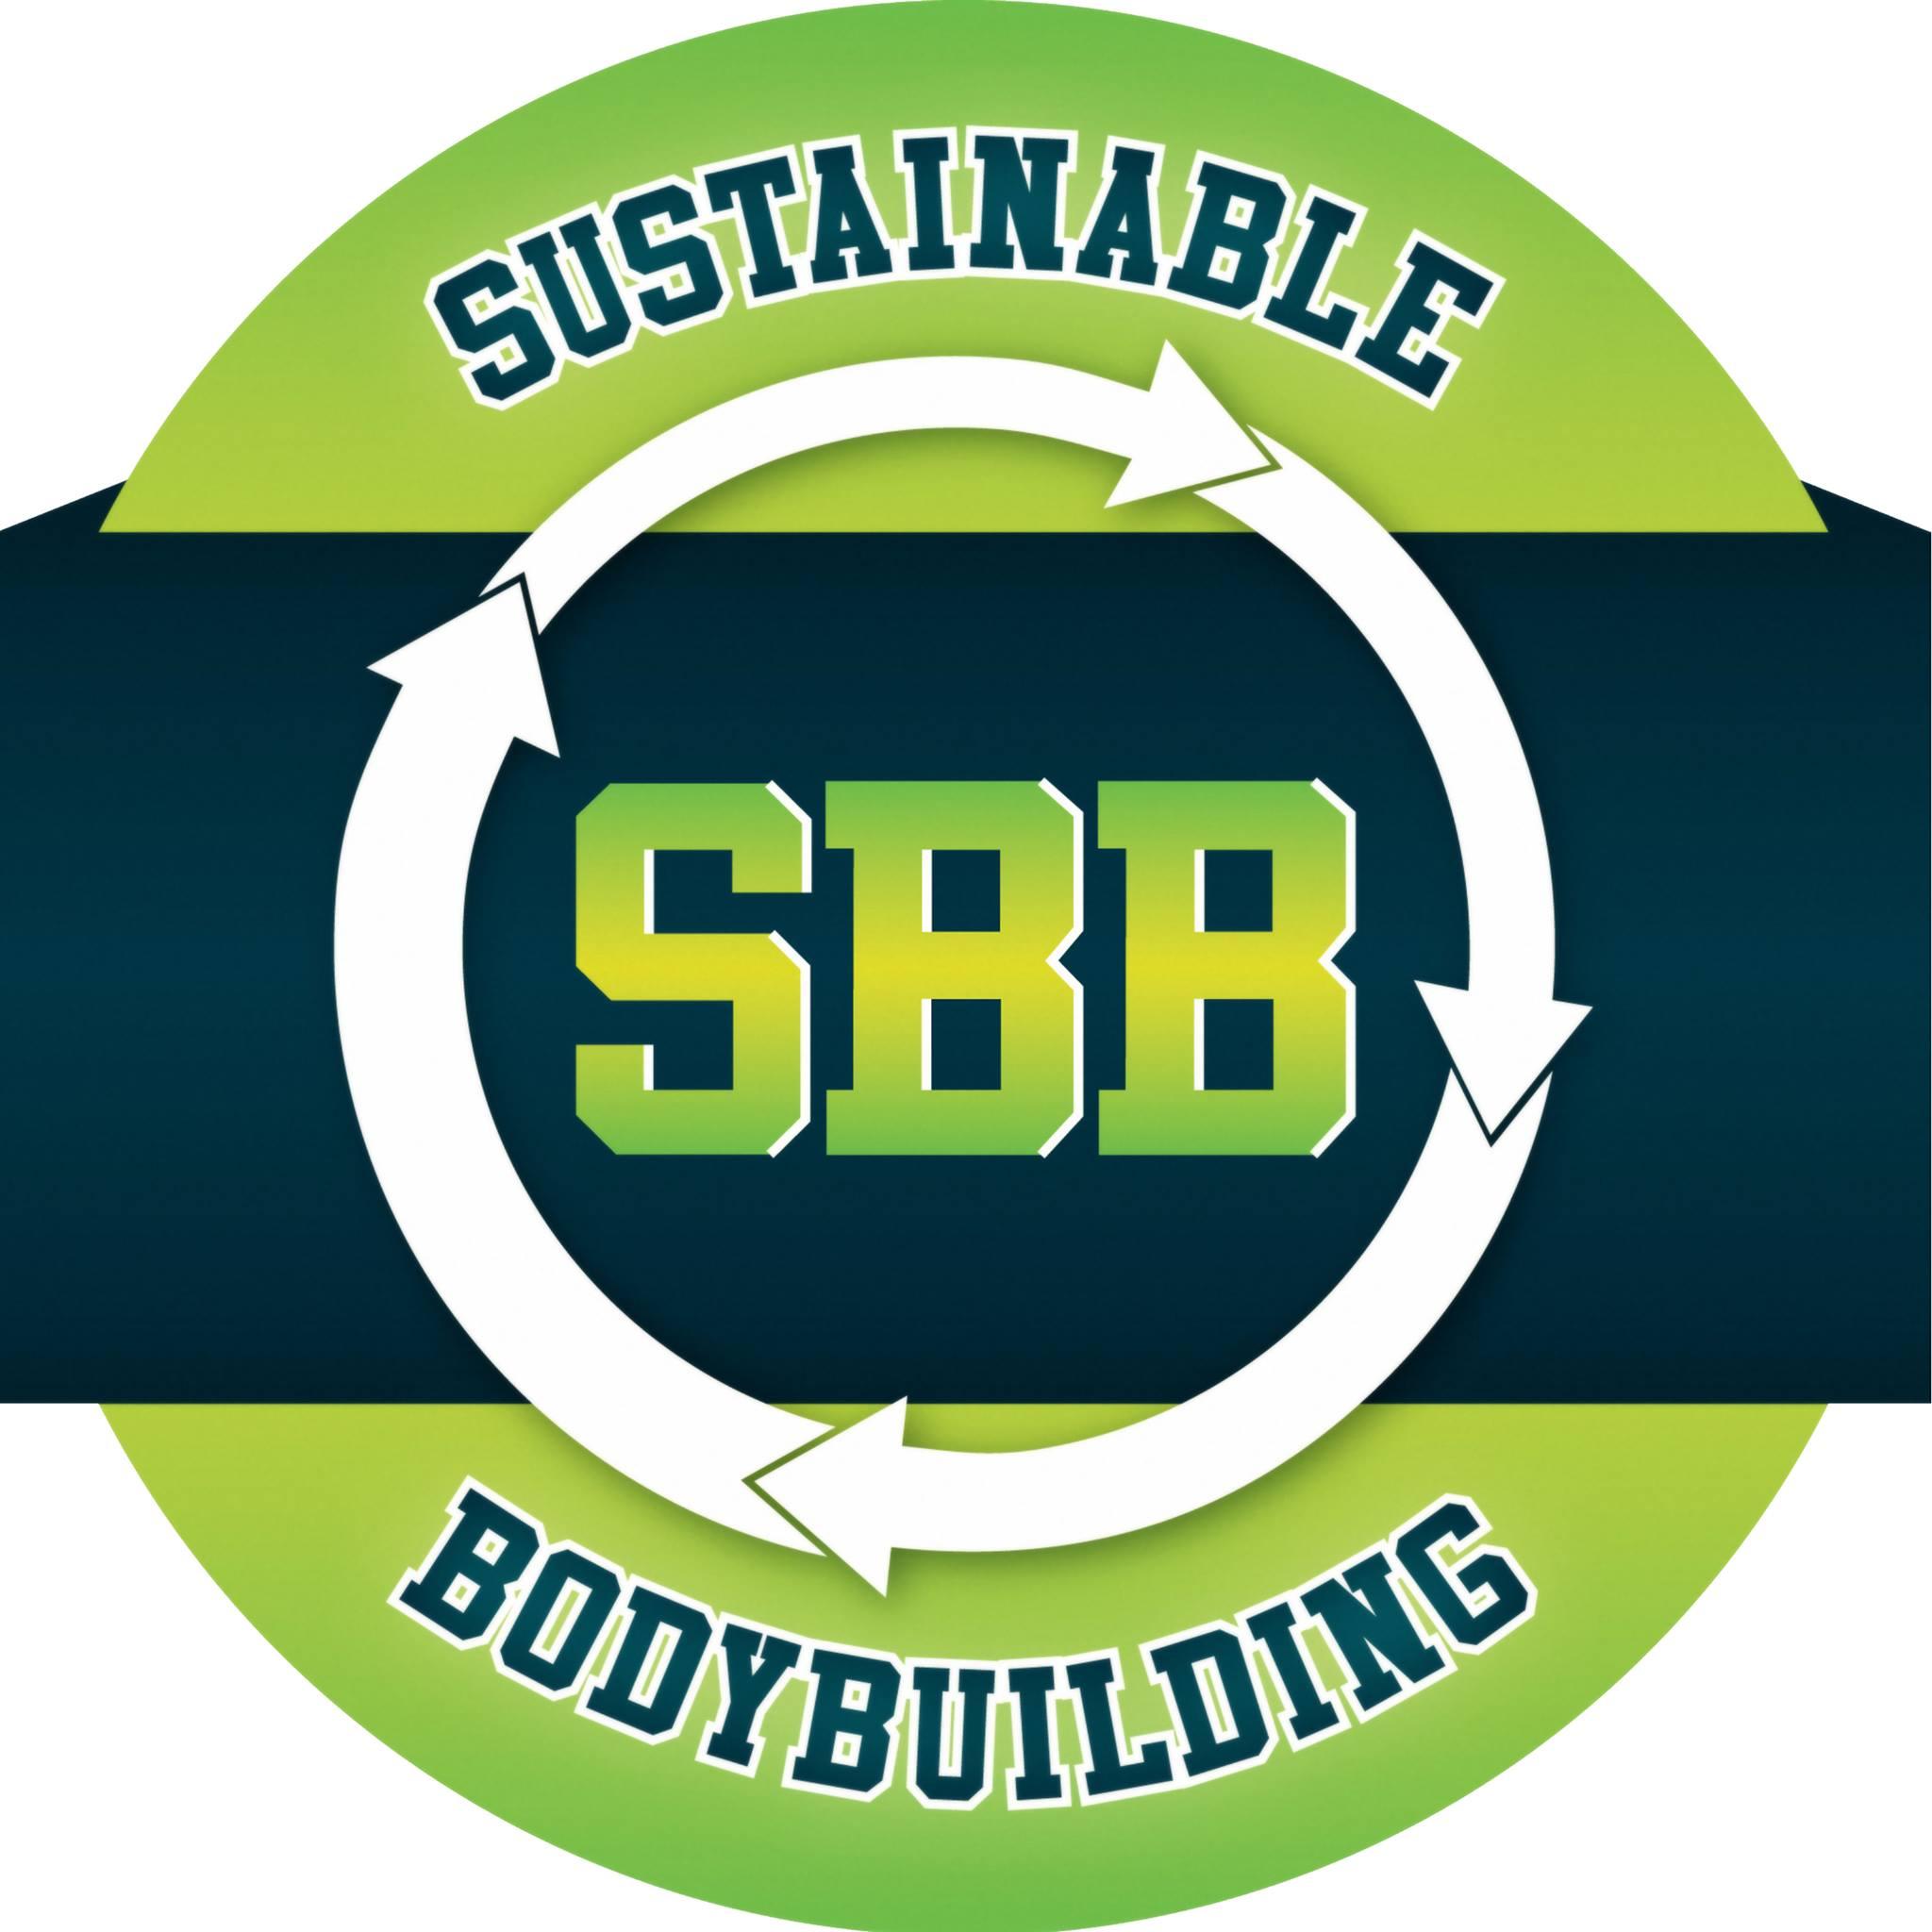 sustainiblebb